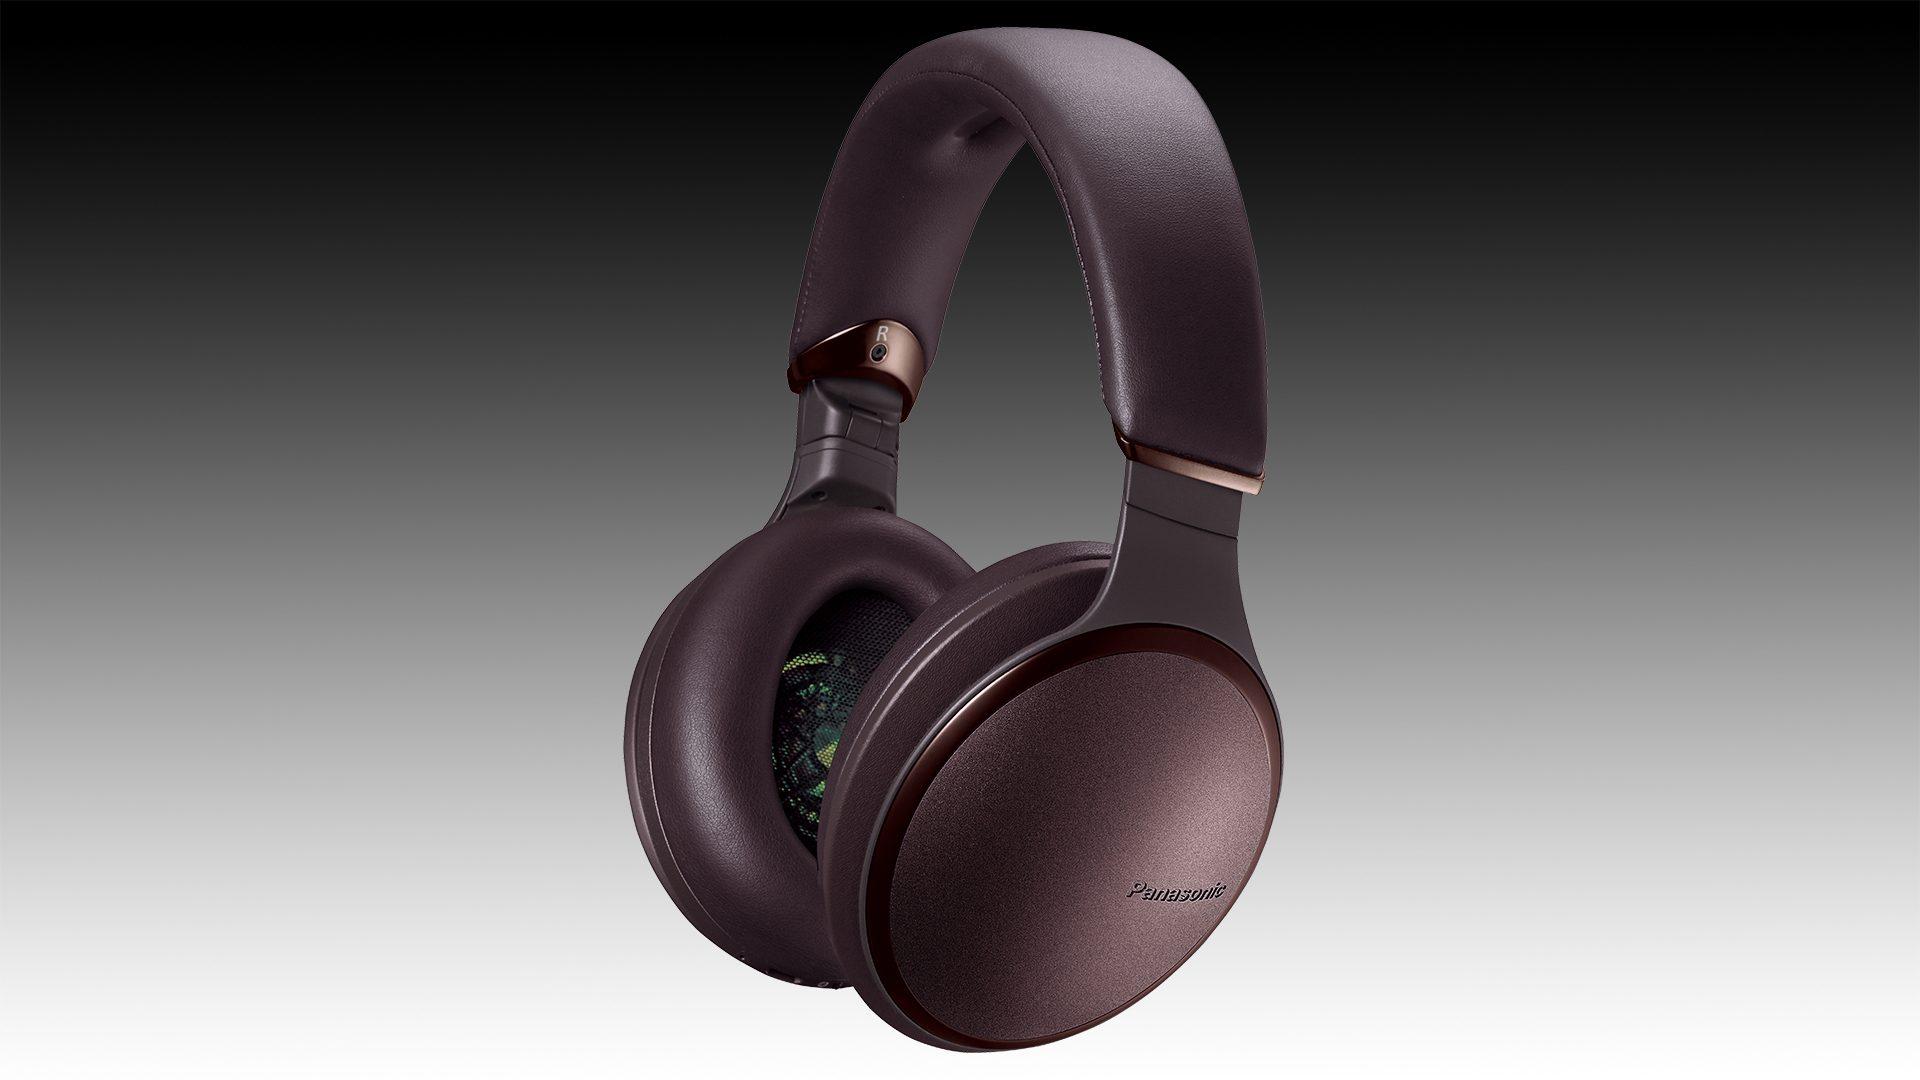 f02330a1b TEST: Panasonic HD-605NE trådløse hodetelefoner | Lyd & Bilde